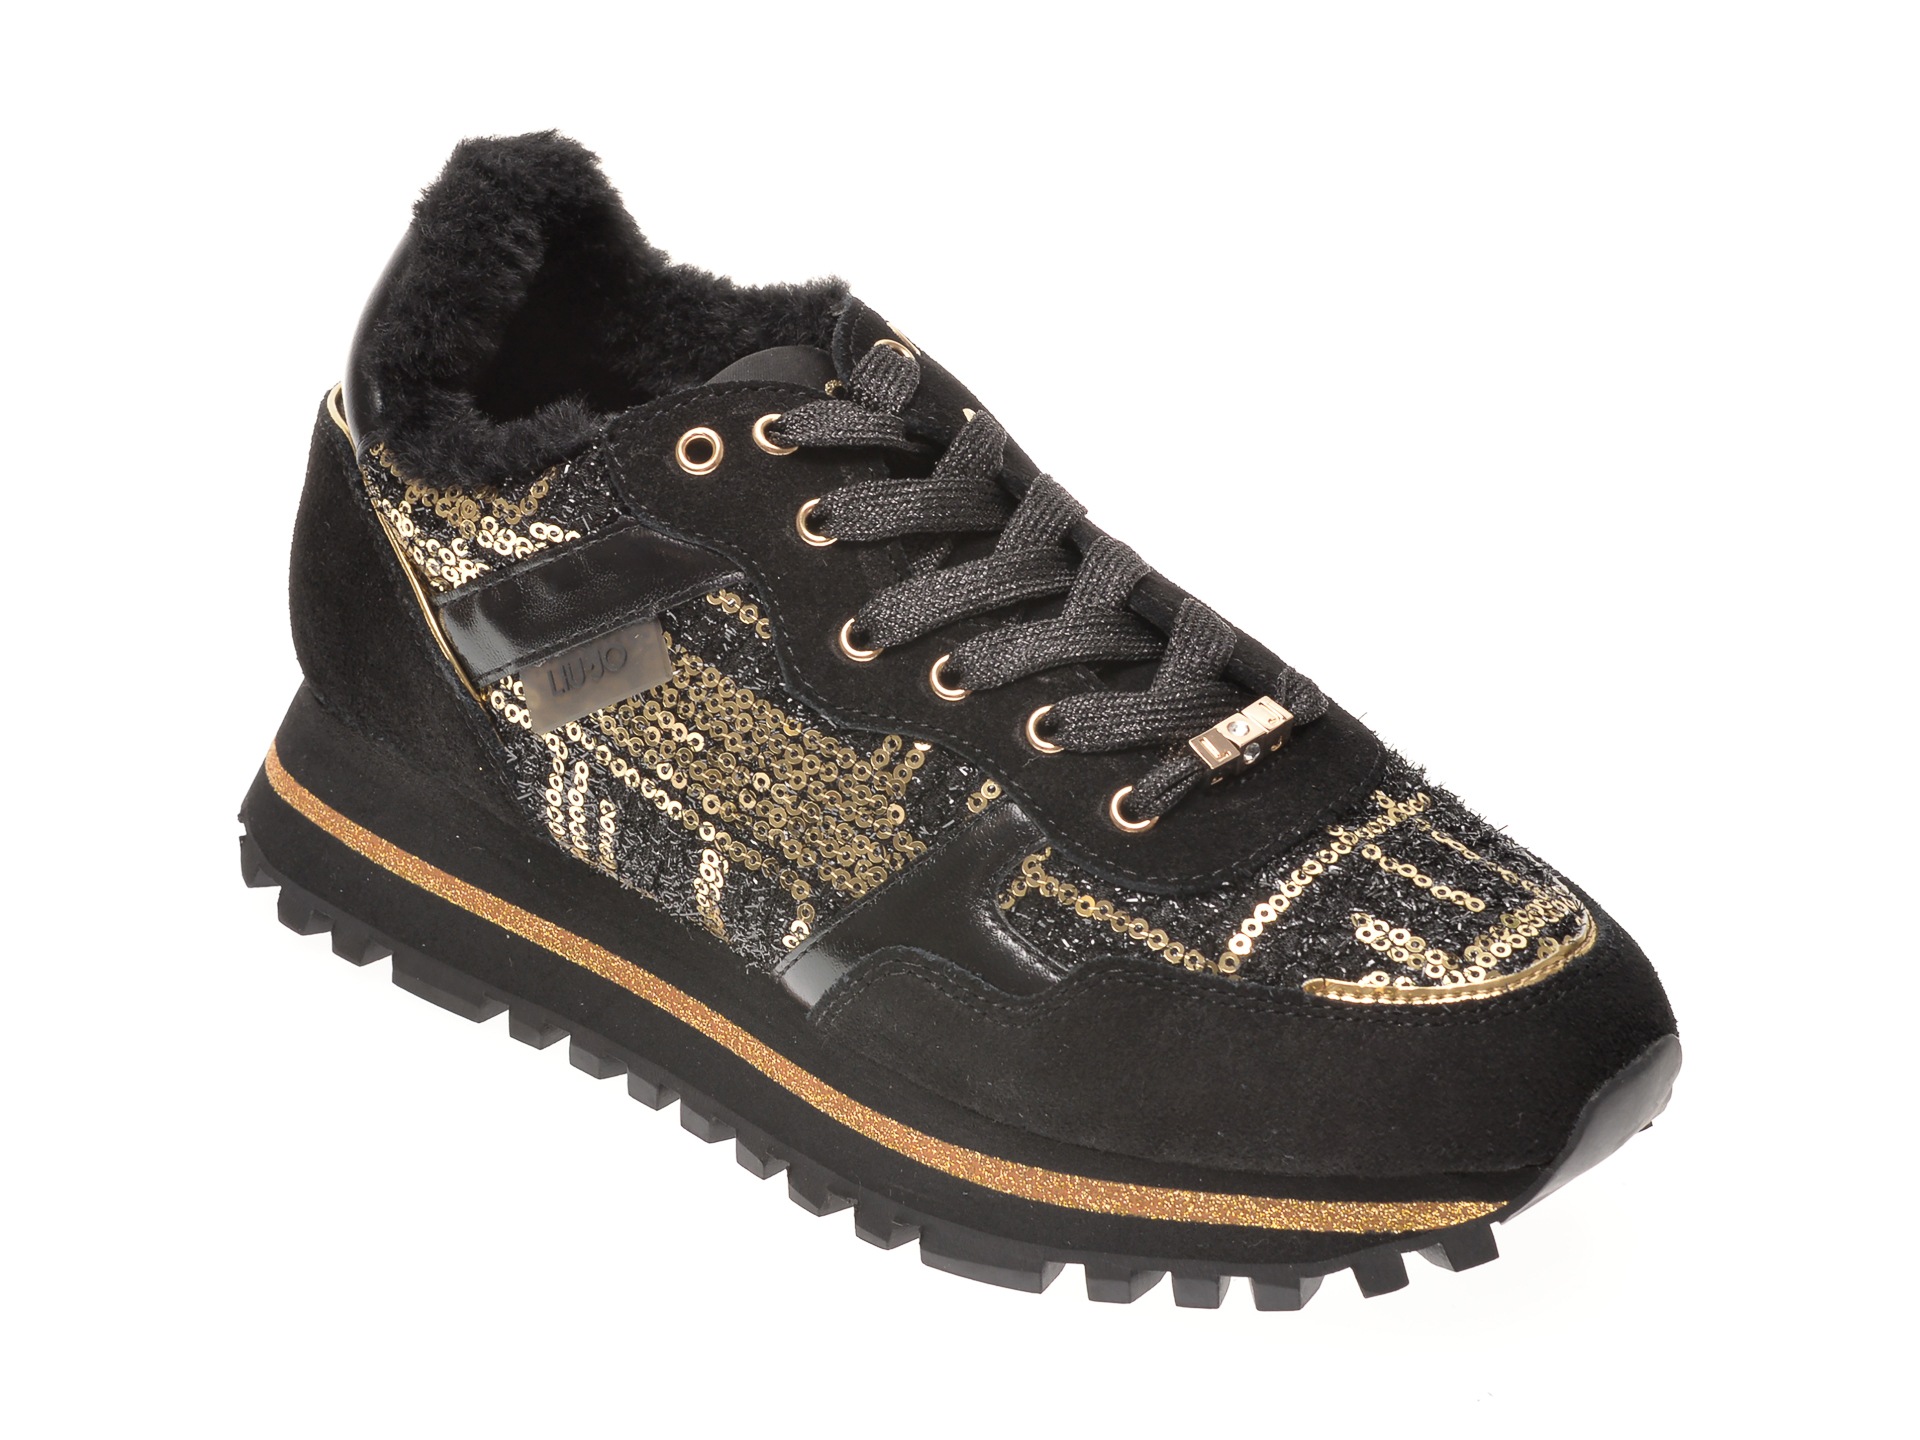 Pantofi Sport Liu Jo Negri, Wonderb, Din Material Textil Si Piele Naturala